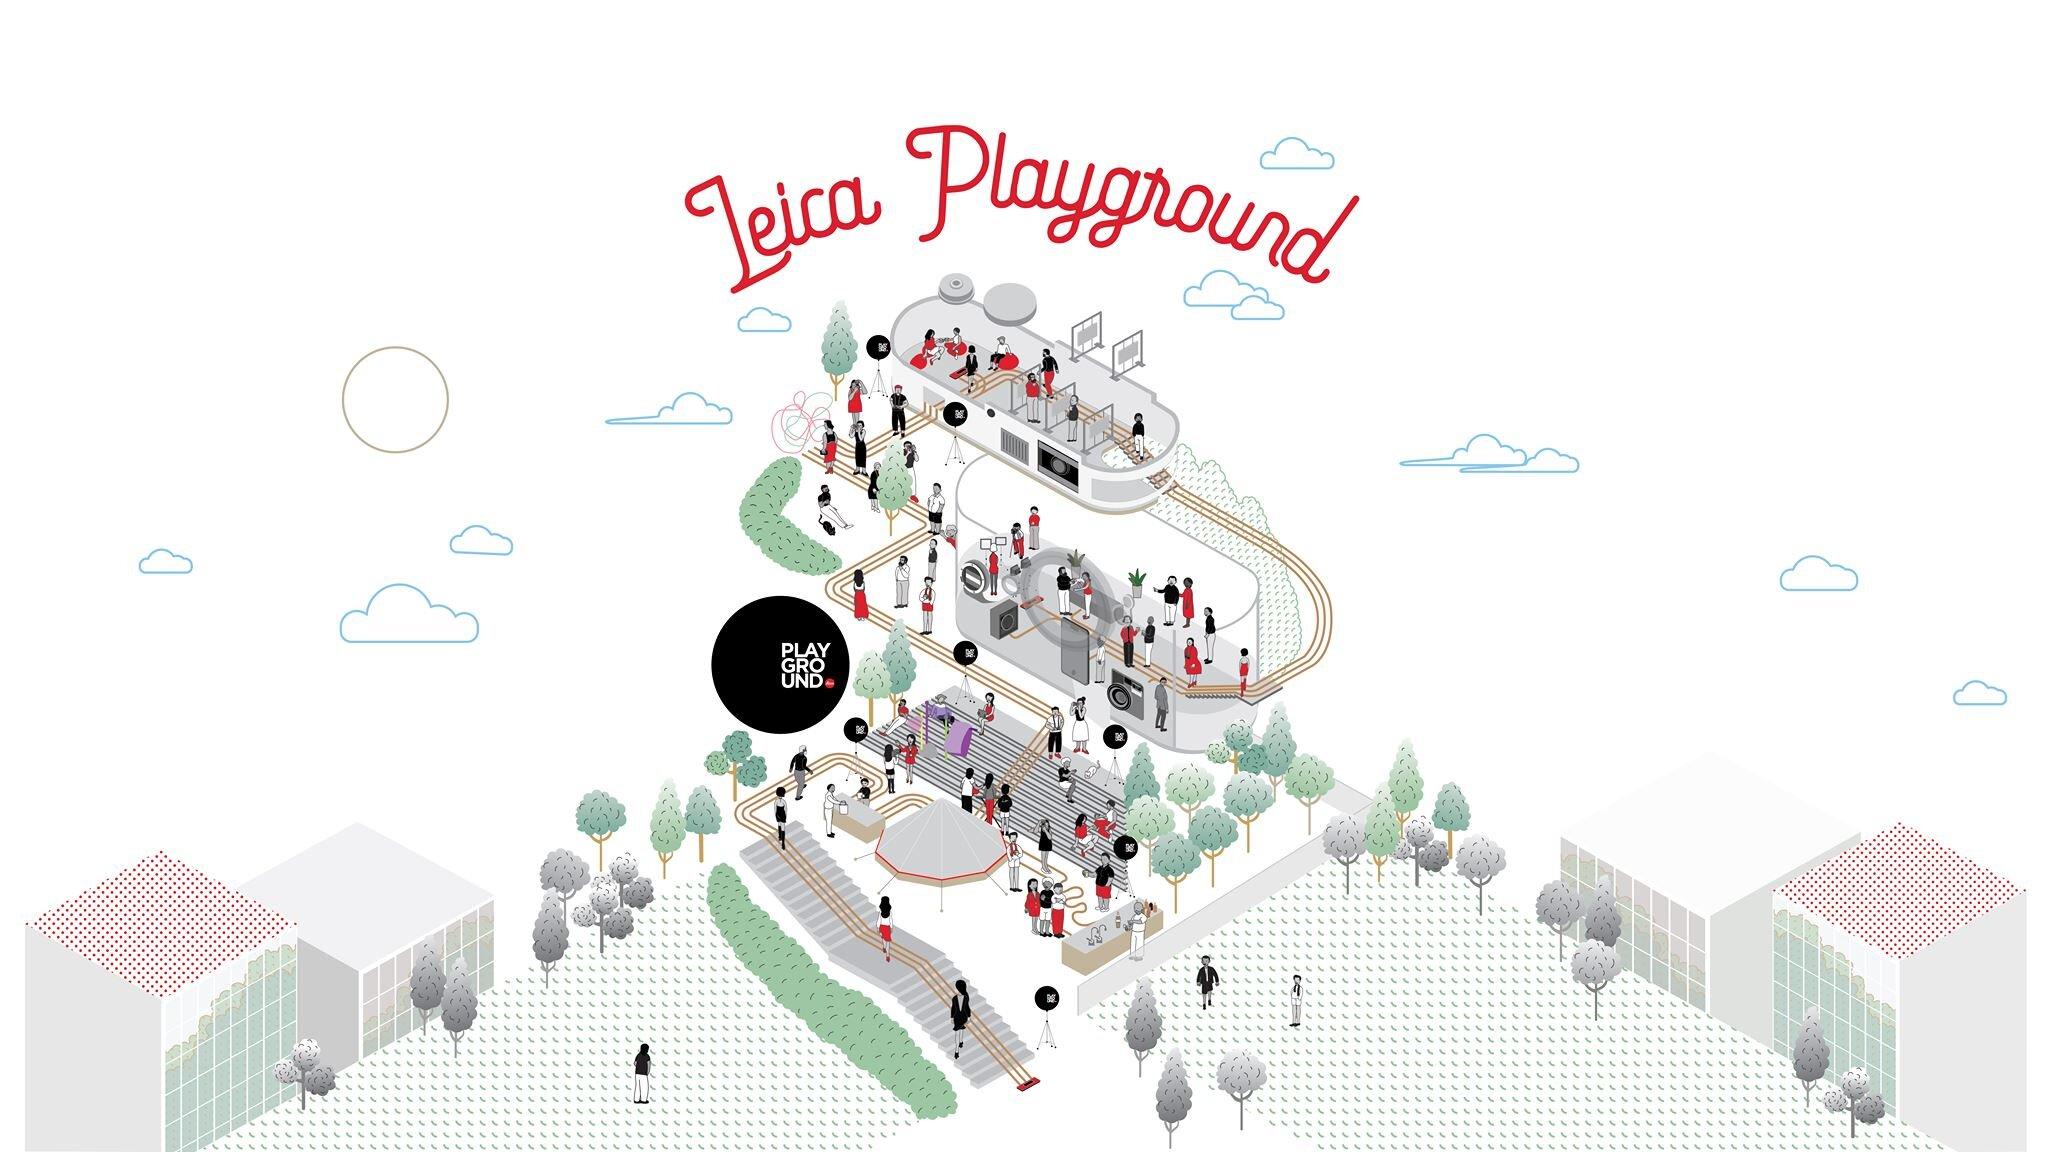 leica playground.jpg